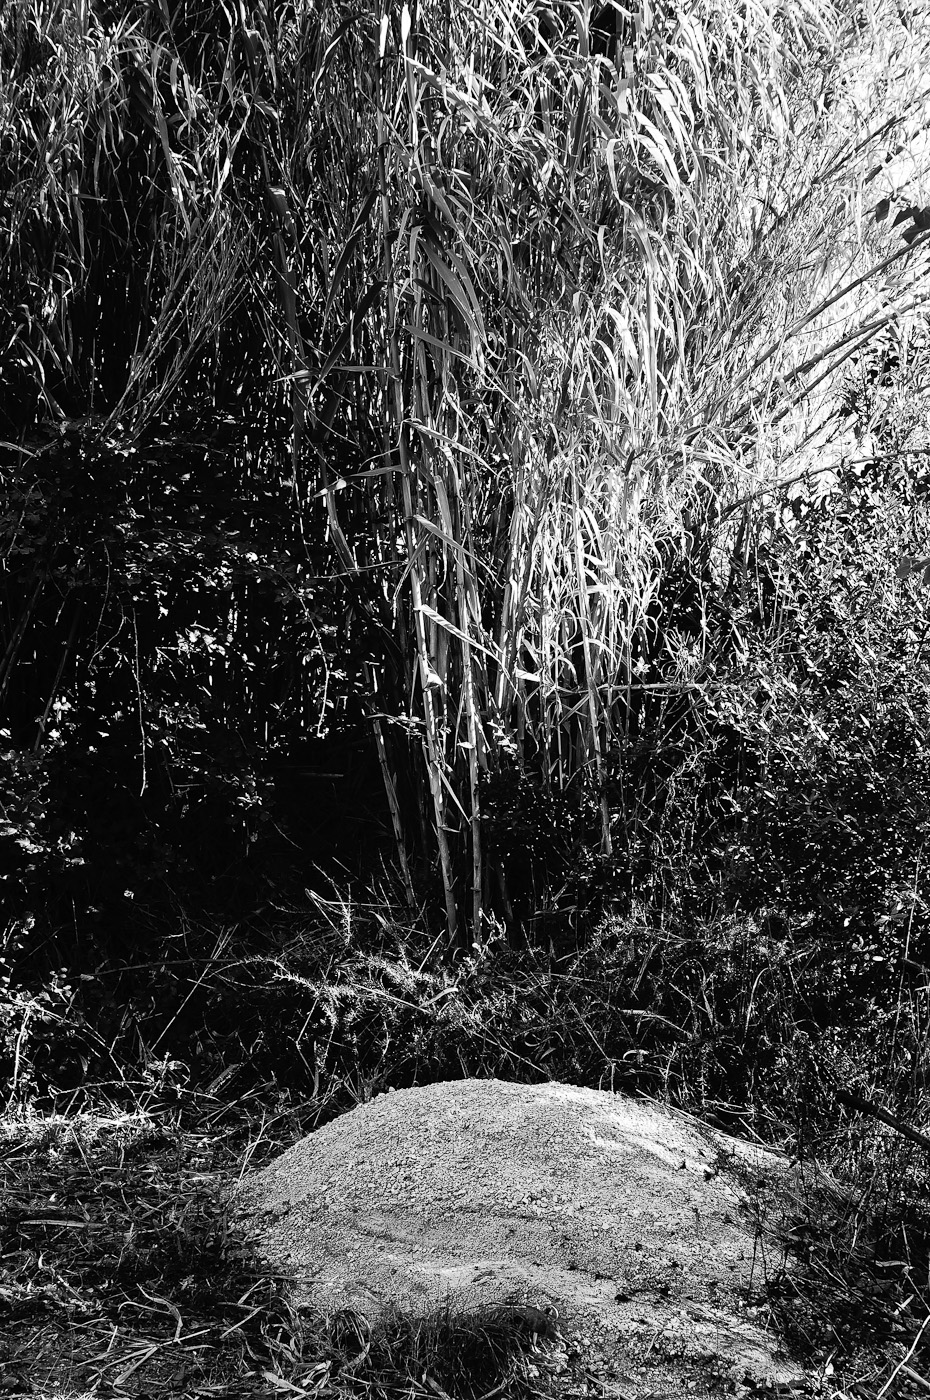 A pile of rubble in a garden shot in B&W by the Sony NEX-5N